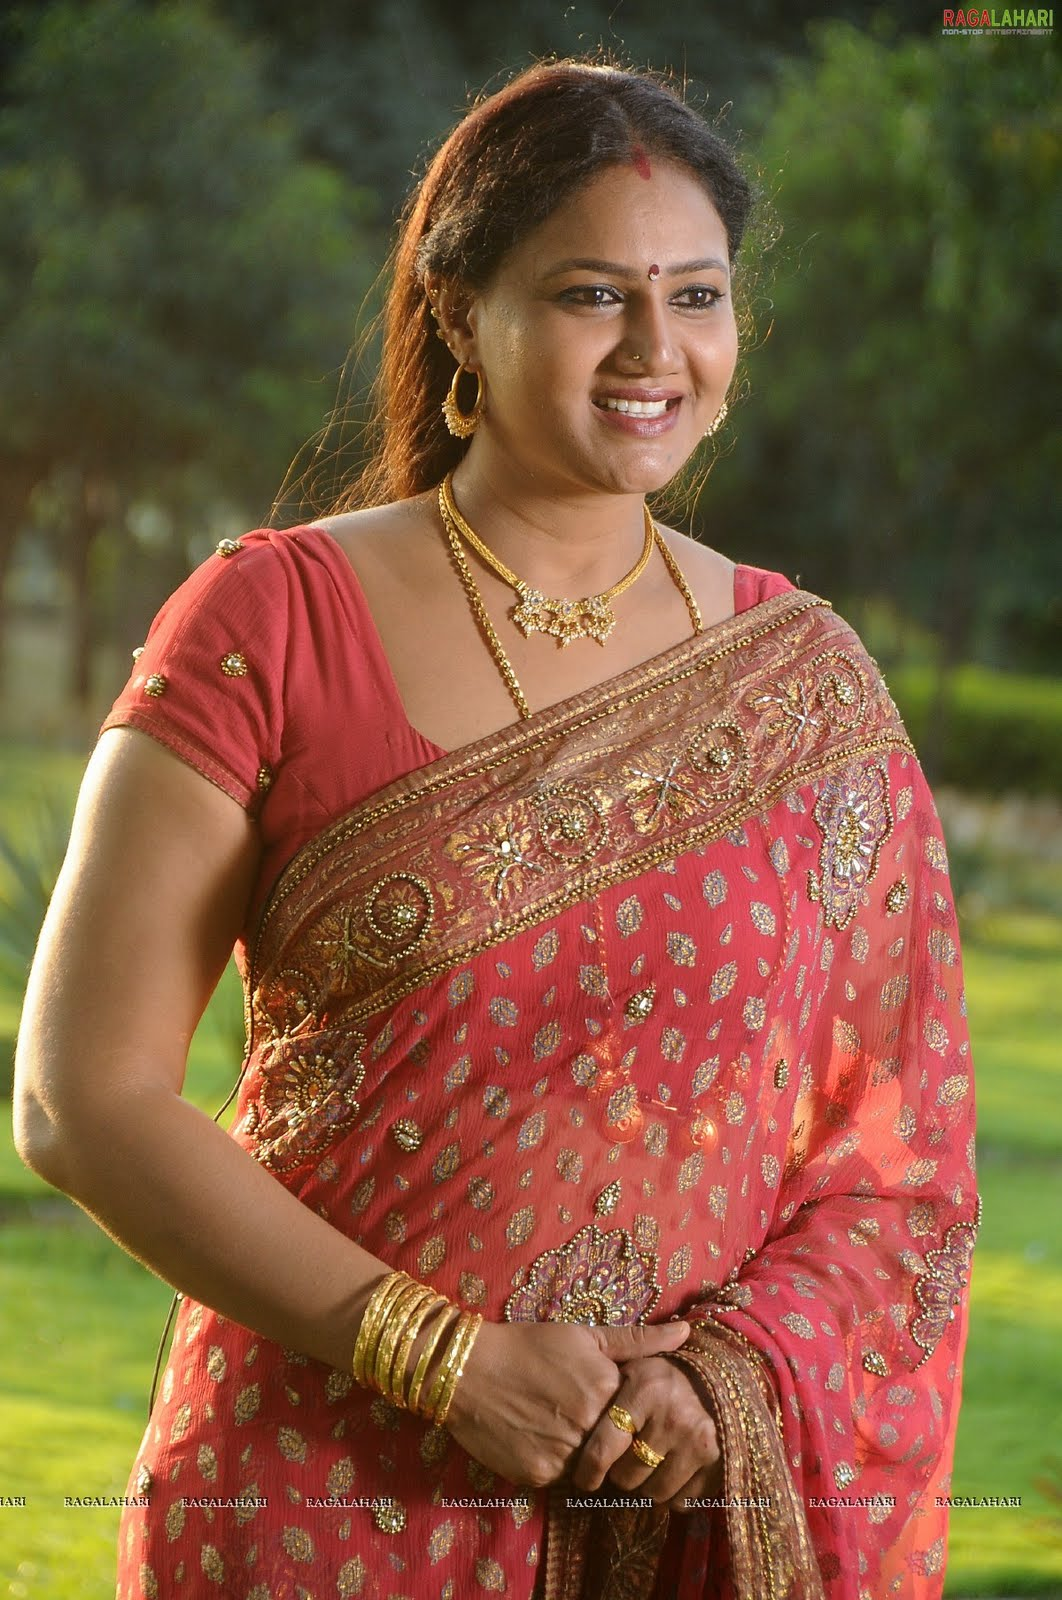 aunty raksha aunties latest still tollywood desi telugu saree housewife actresses cleavage spicy reactions